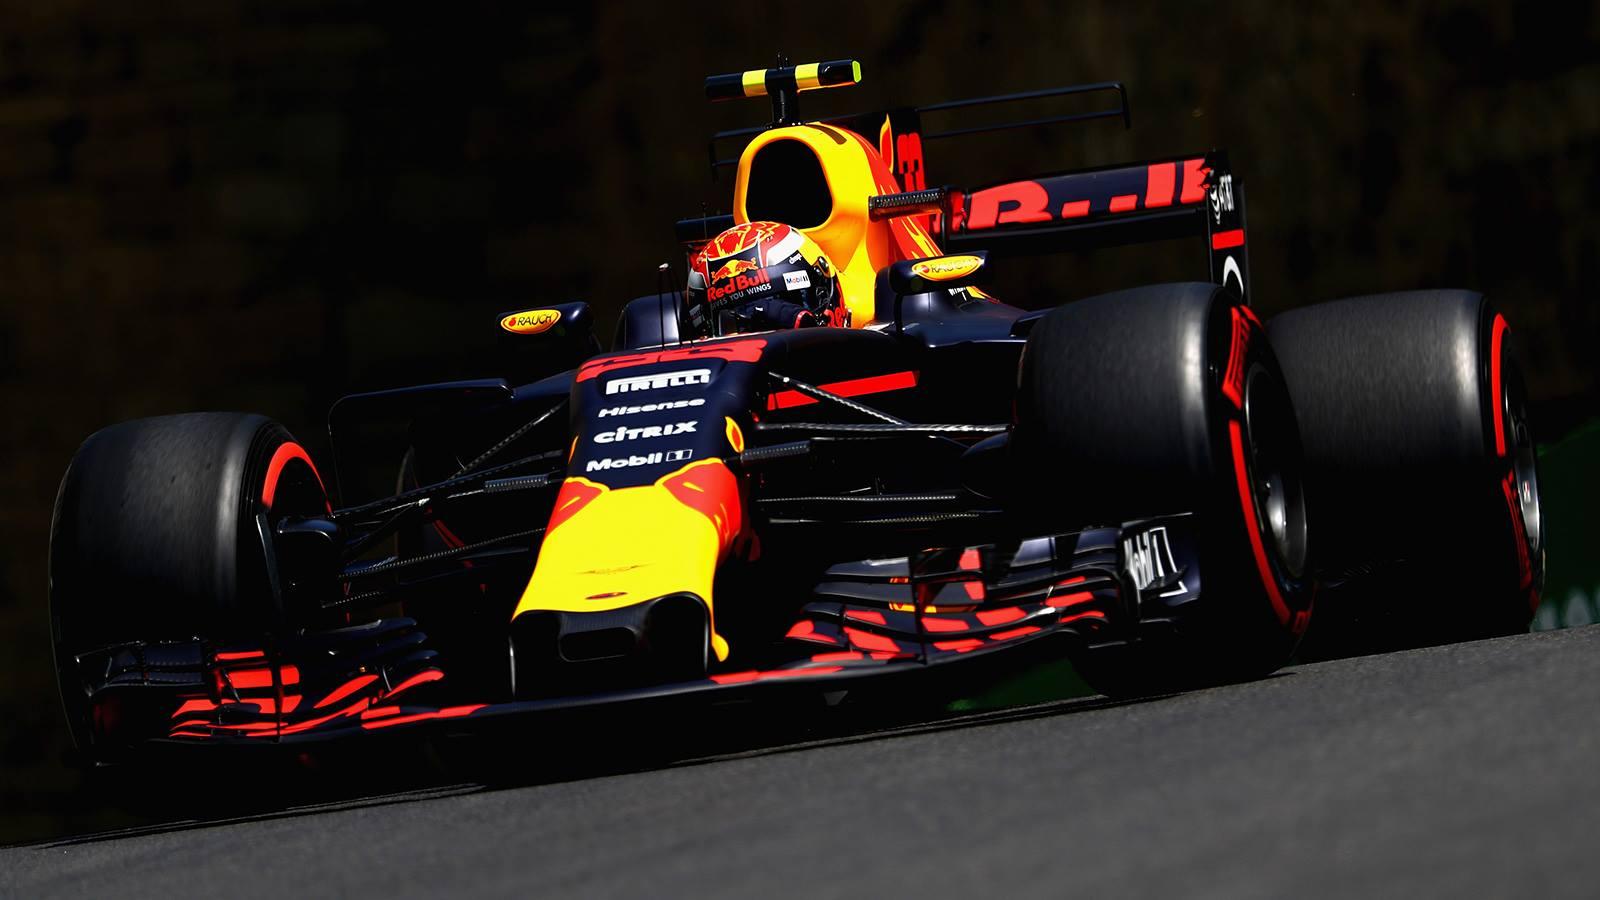 Formel 1 c - Formel 1 bilder